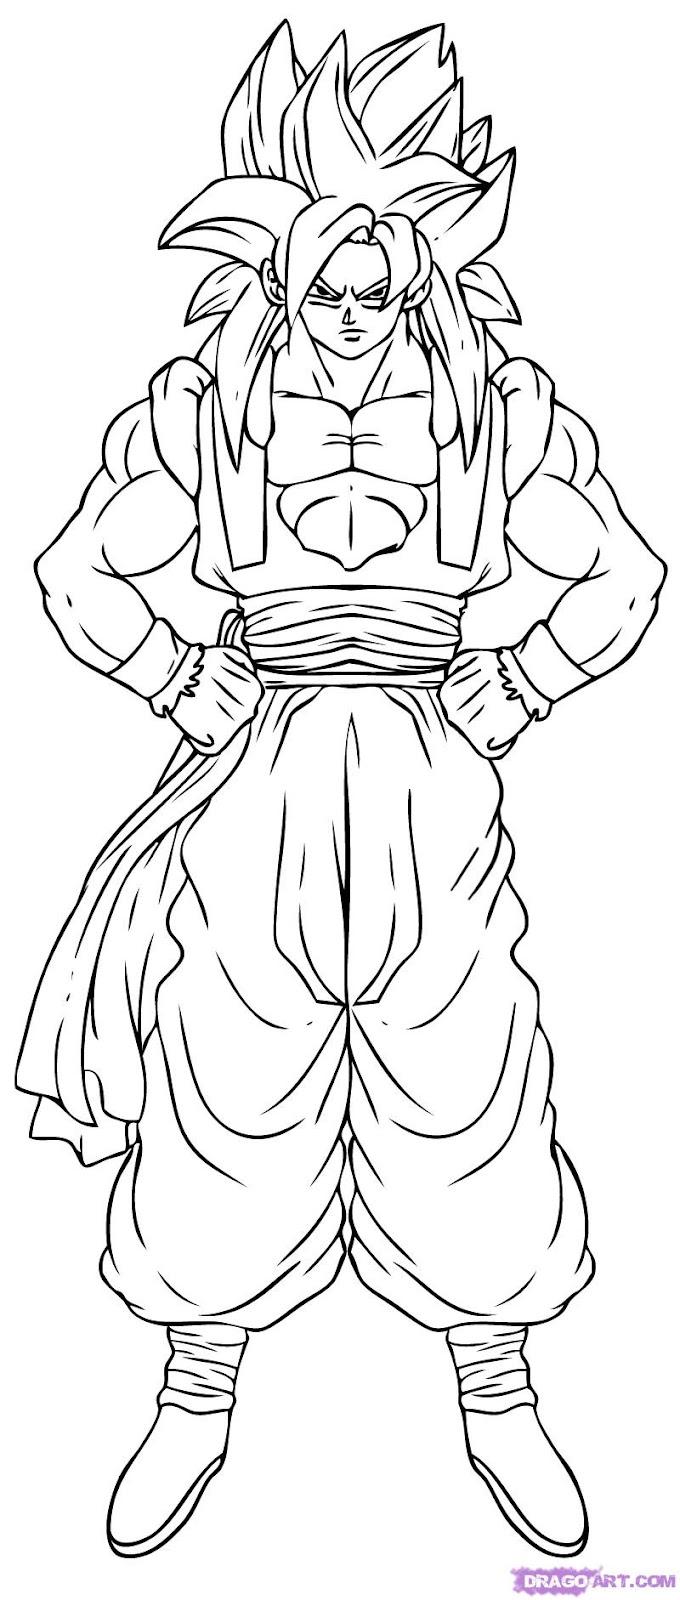 goku super saiyan 4 super saiyan goku by autonomousanomalies on deviantart goku super saiyan 4